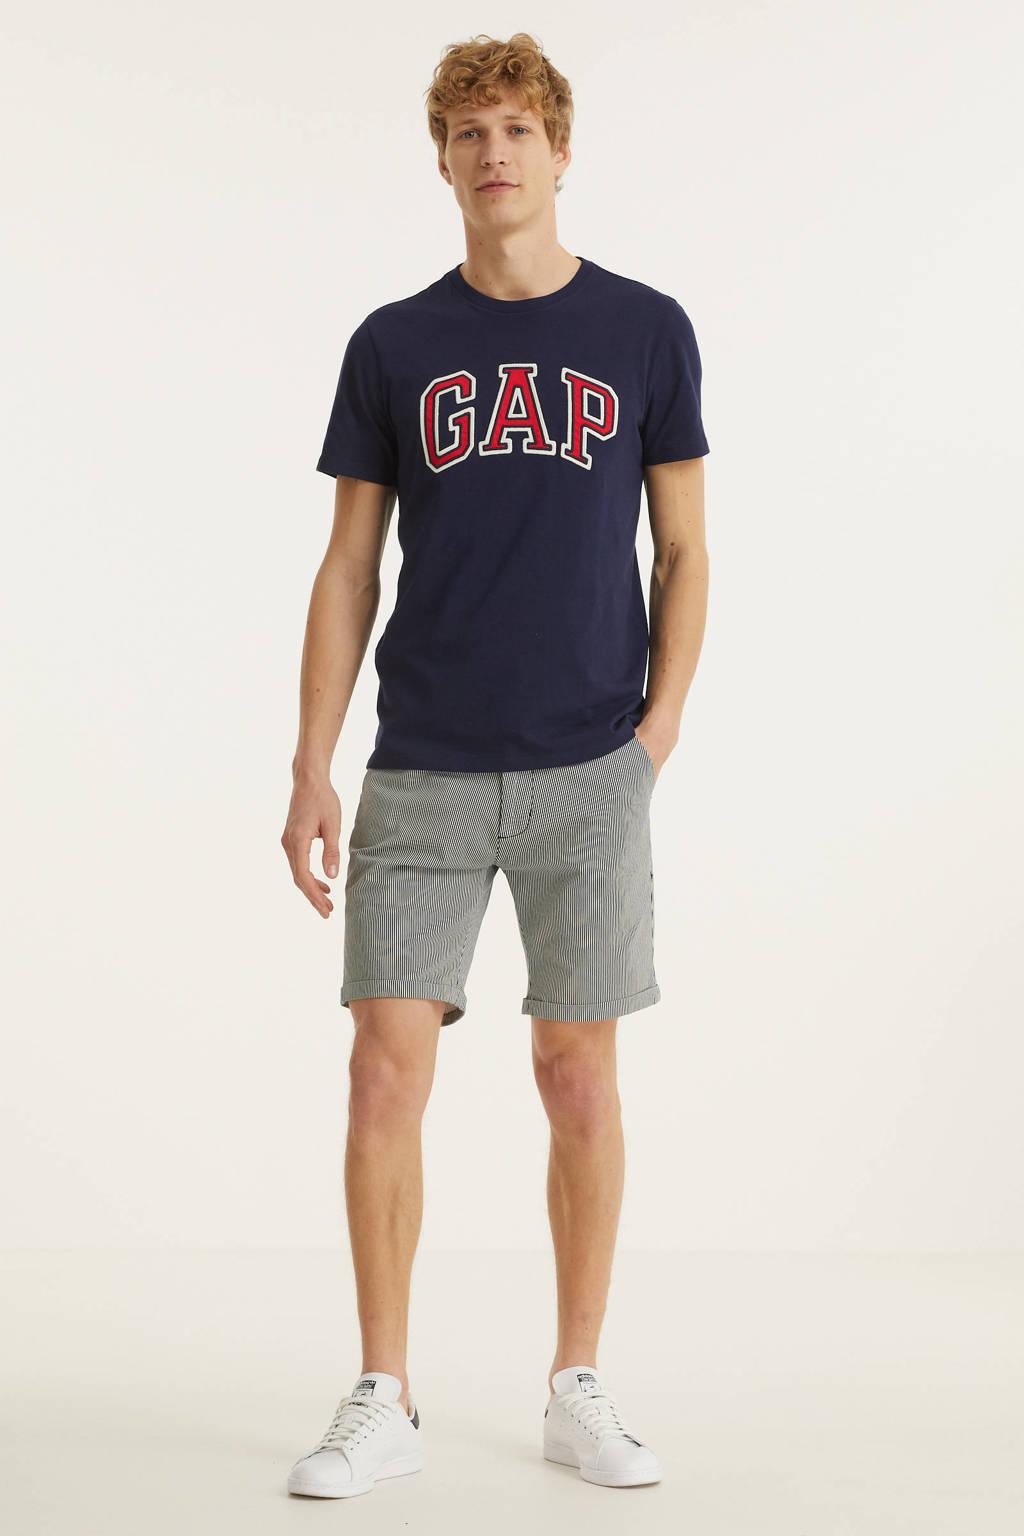 GAP T-shirt Bas Arch met logo donkerblauw, Donkerblauw